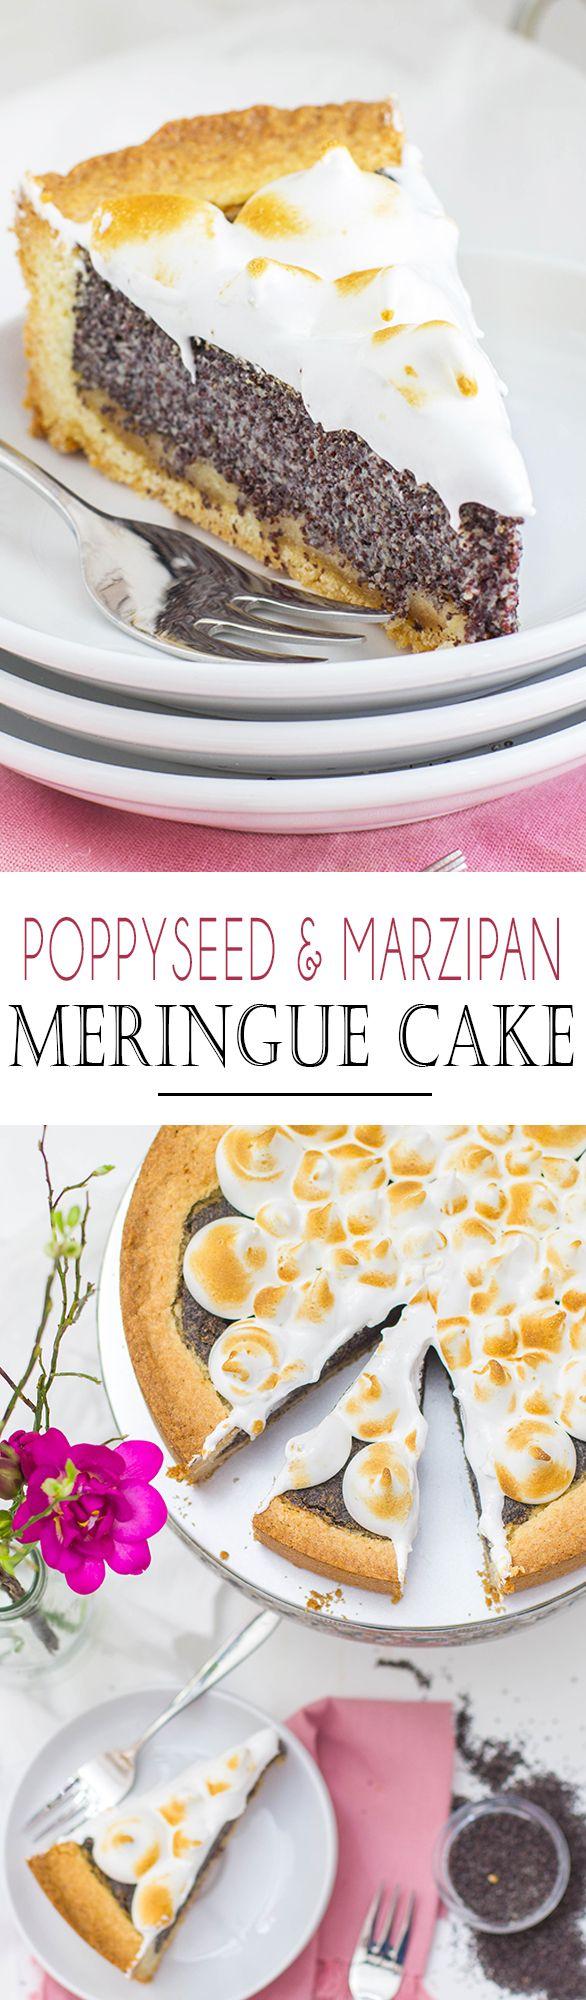 Poppyseed and Marzipan Meringue Cake   Mohn und Marzipan Kuchen mit Baiser